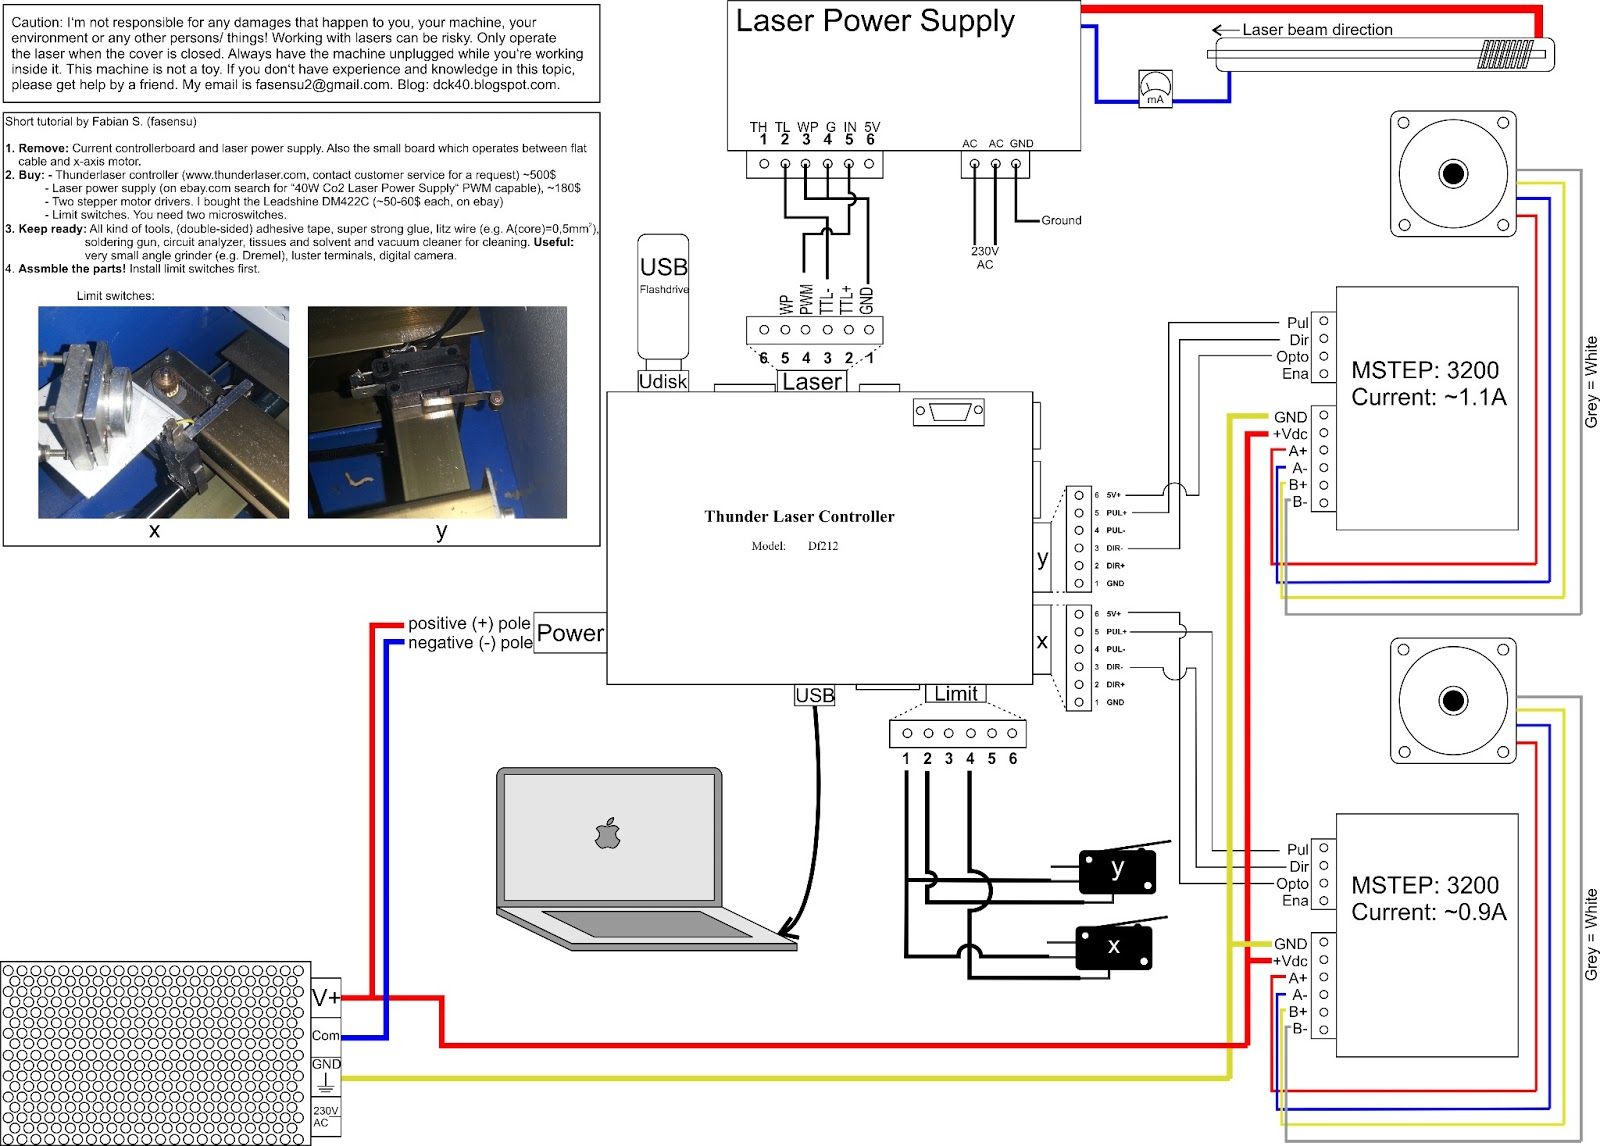 medium resolution of k40 wiring diagram wiring diagram operationsk40 fuse diagram wiring diagram show k40 radar wiring diagram k40